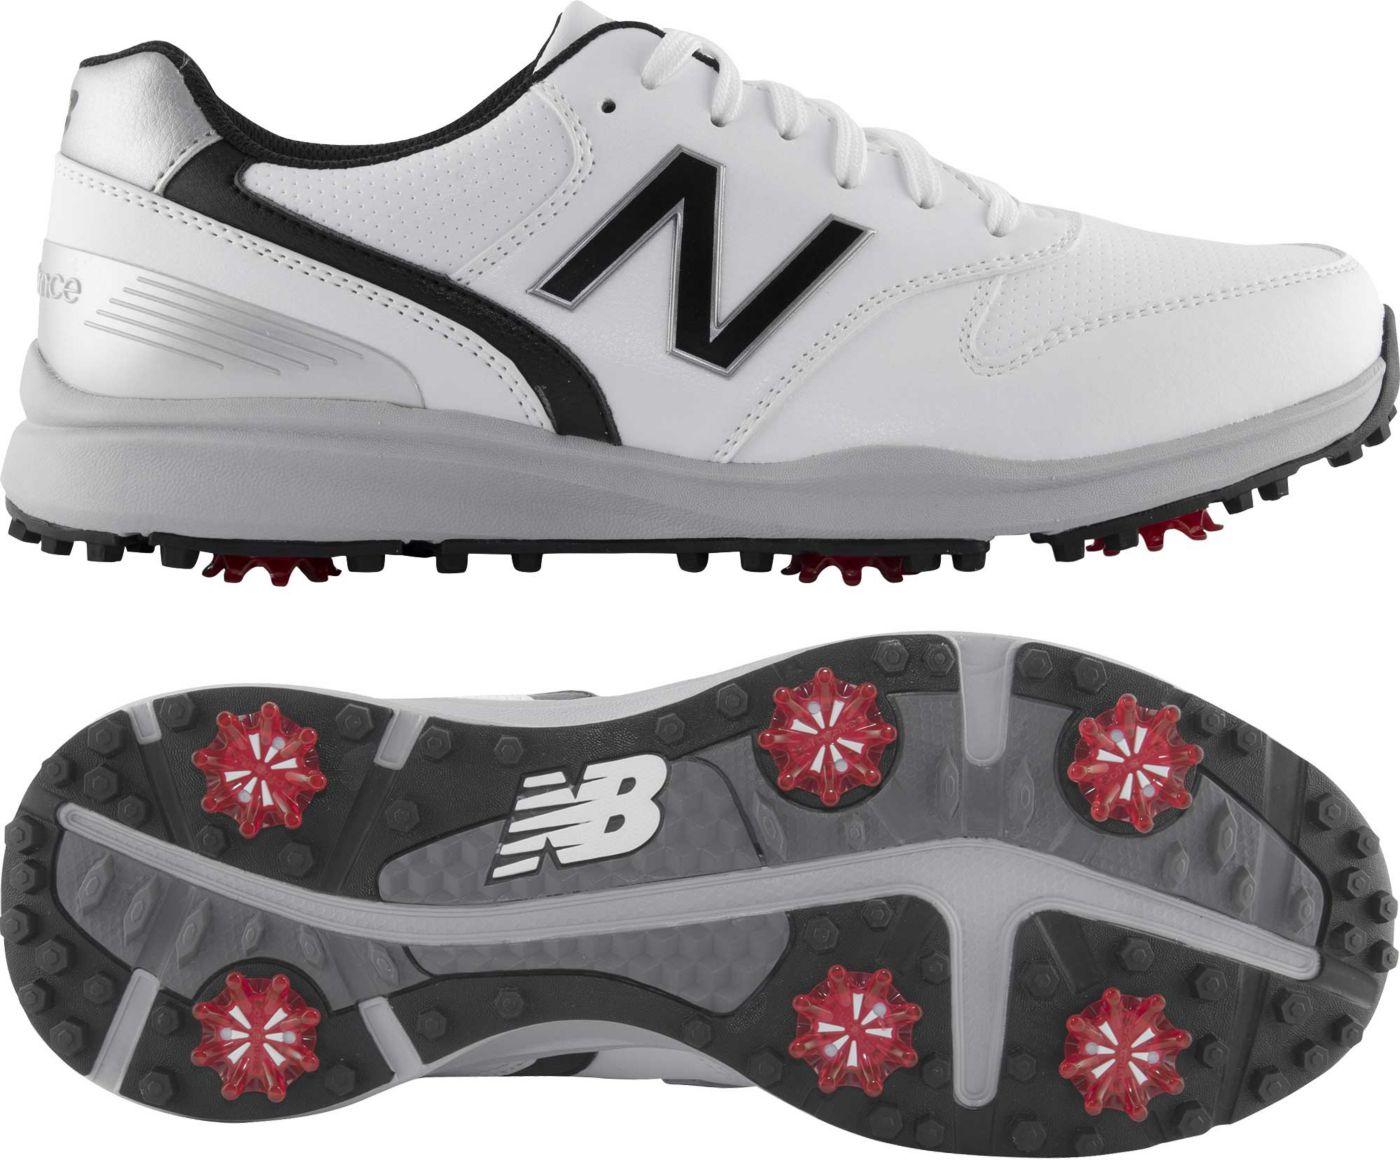 New Balance Men's Sweeper Golf Shoes